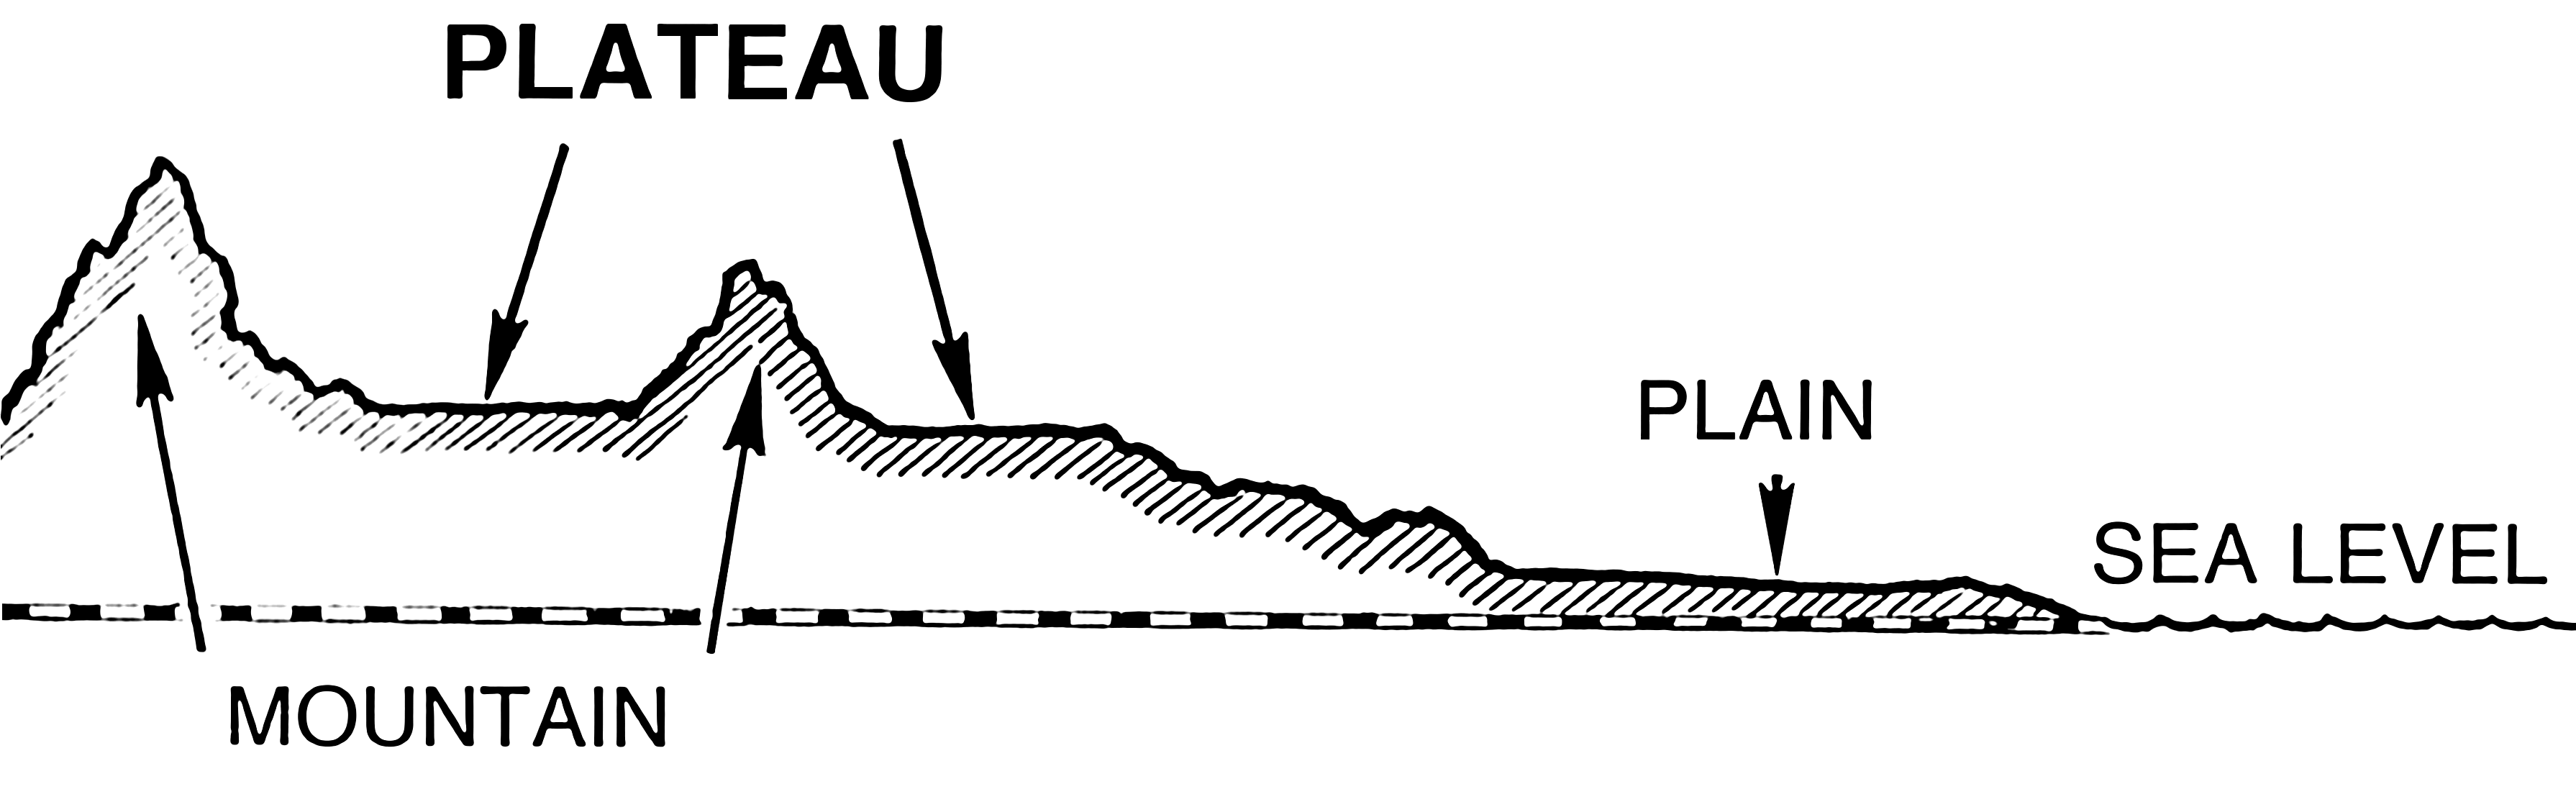 Plateau meaning and definition - Definition d un plateau ...